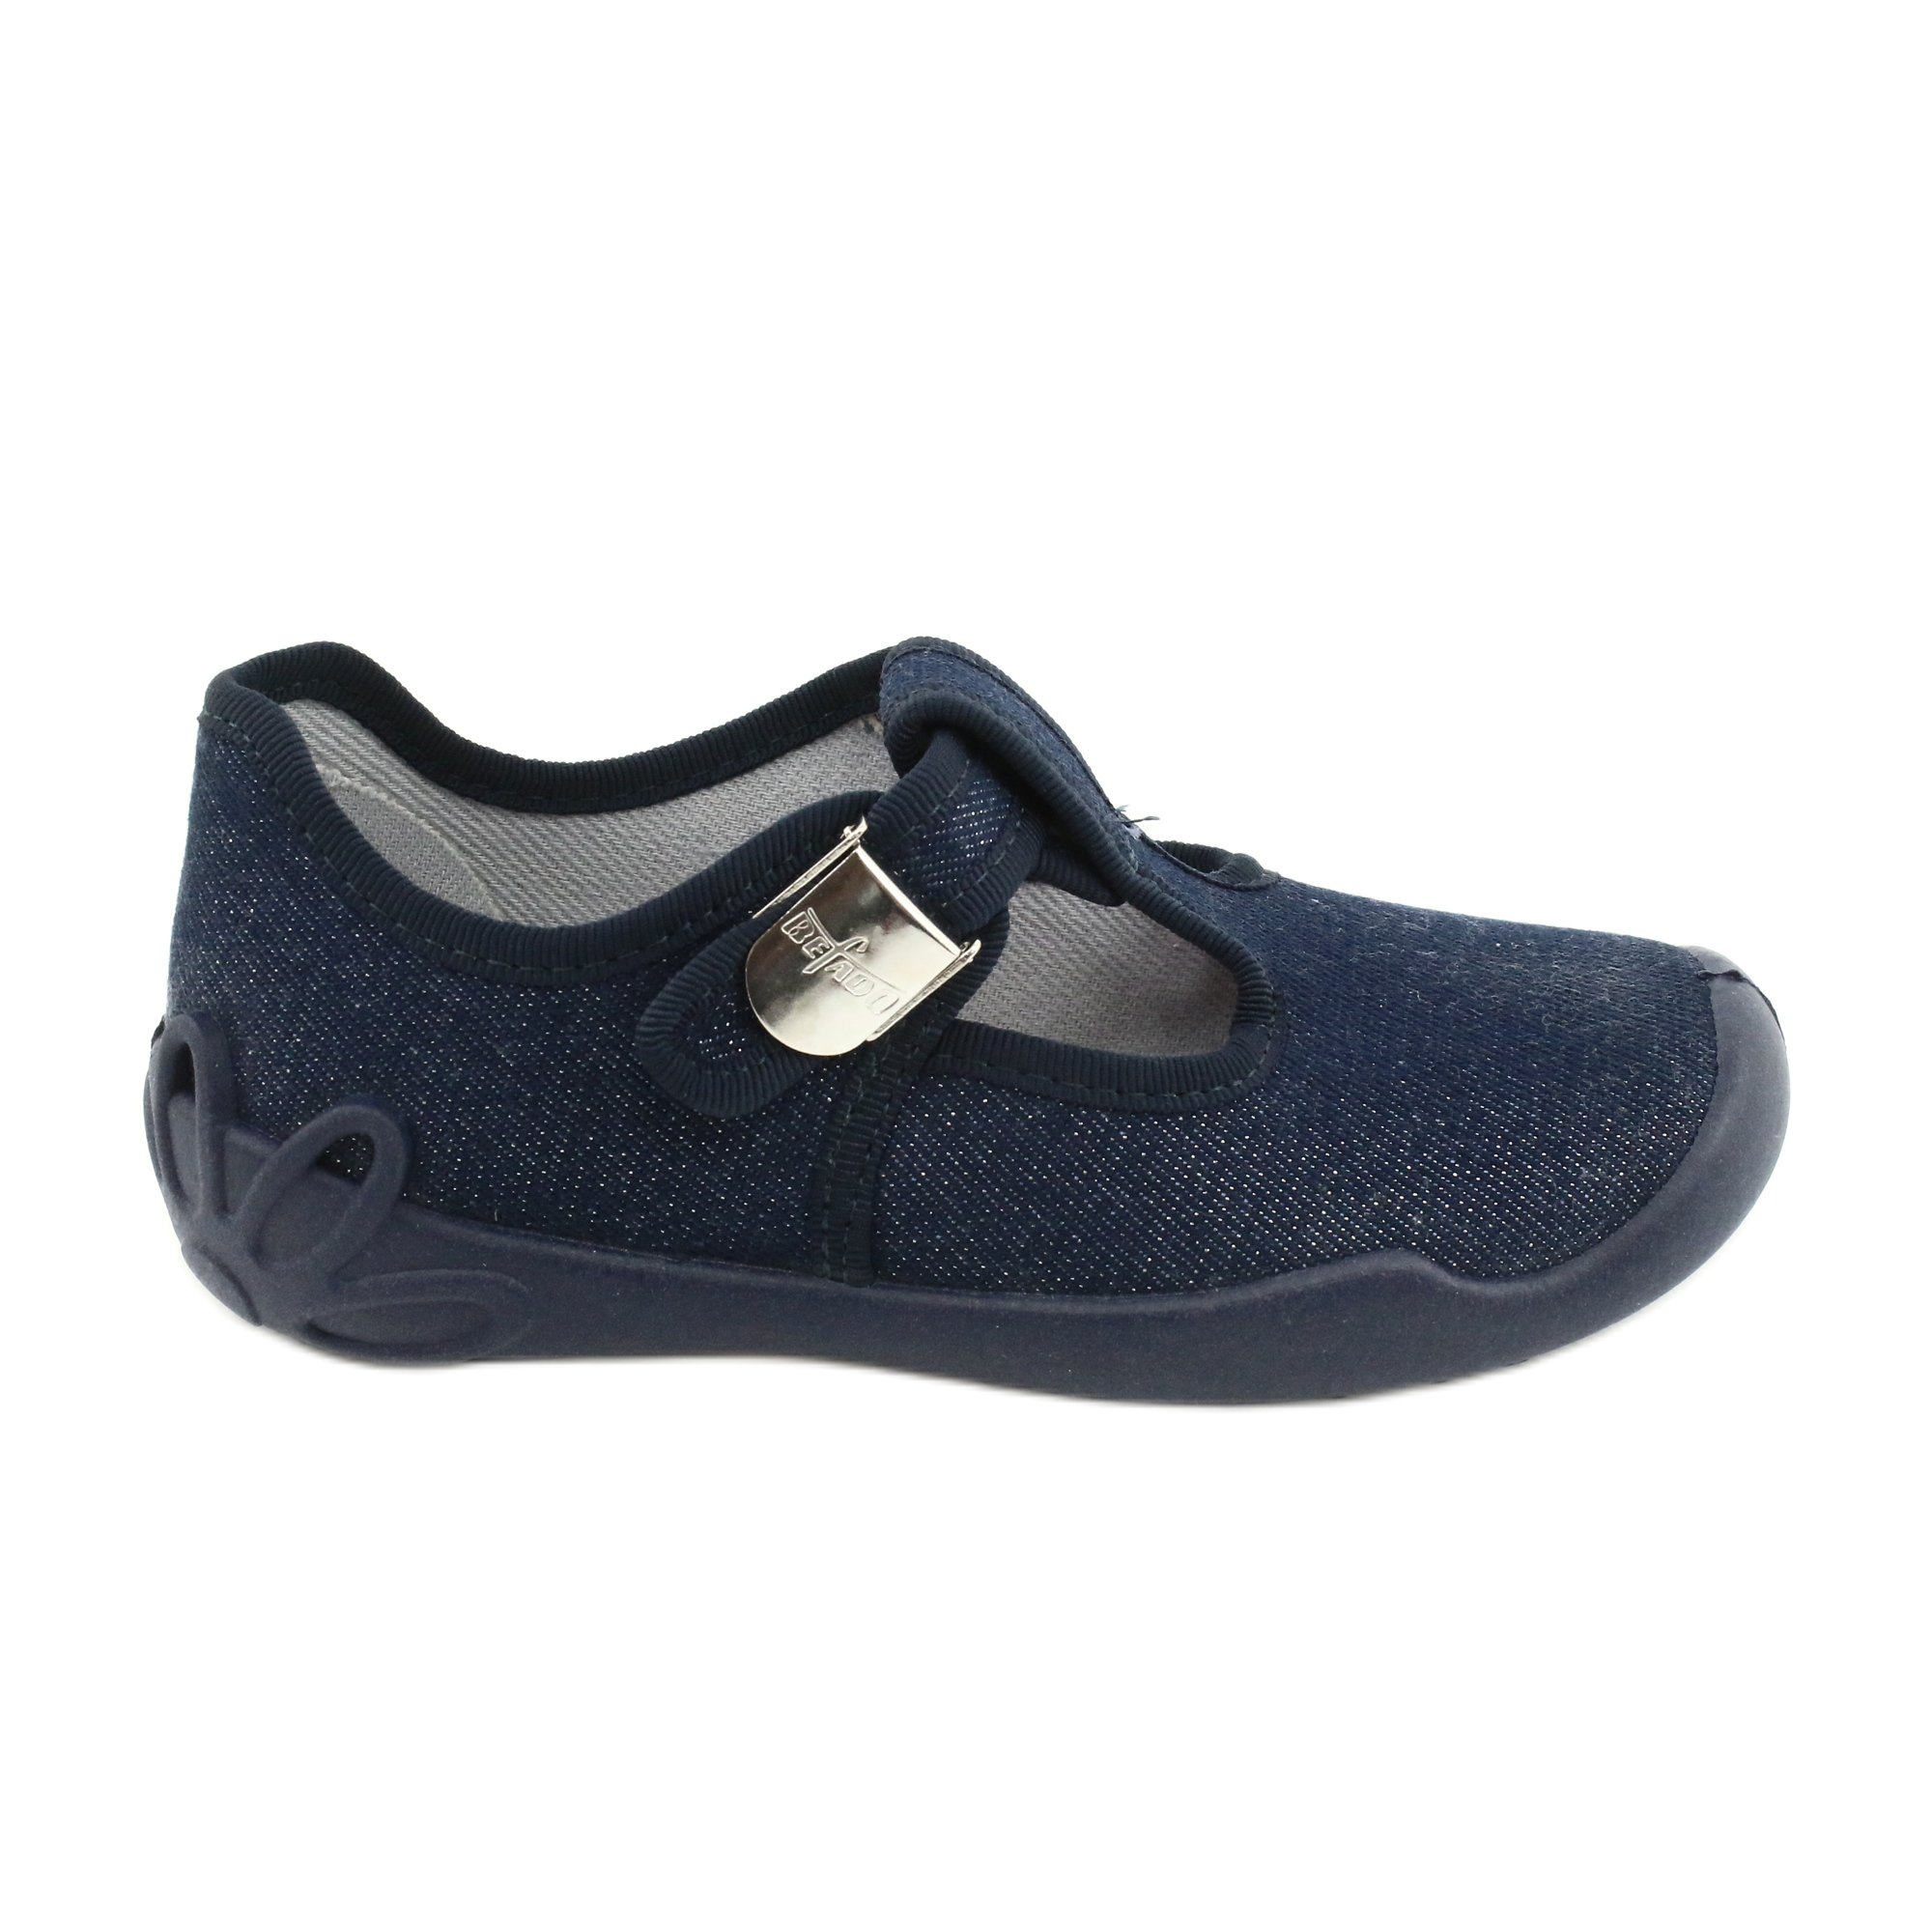 Scarpe per bambini Befado in bianco blu navy